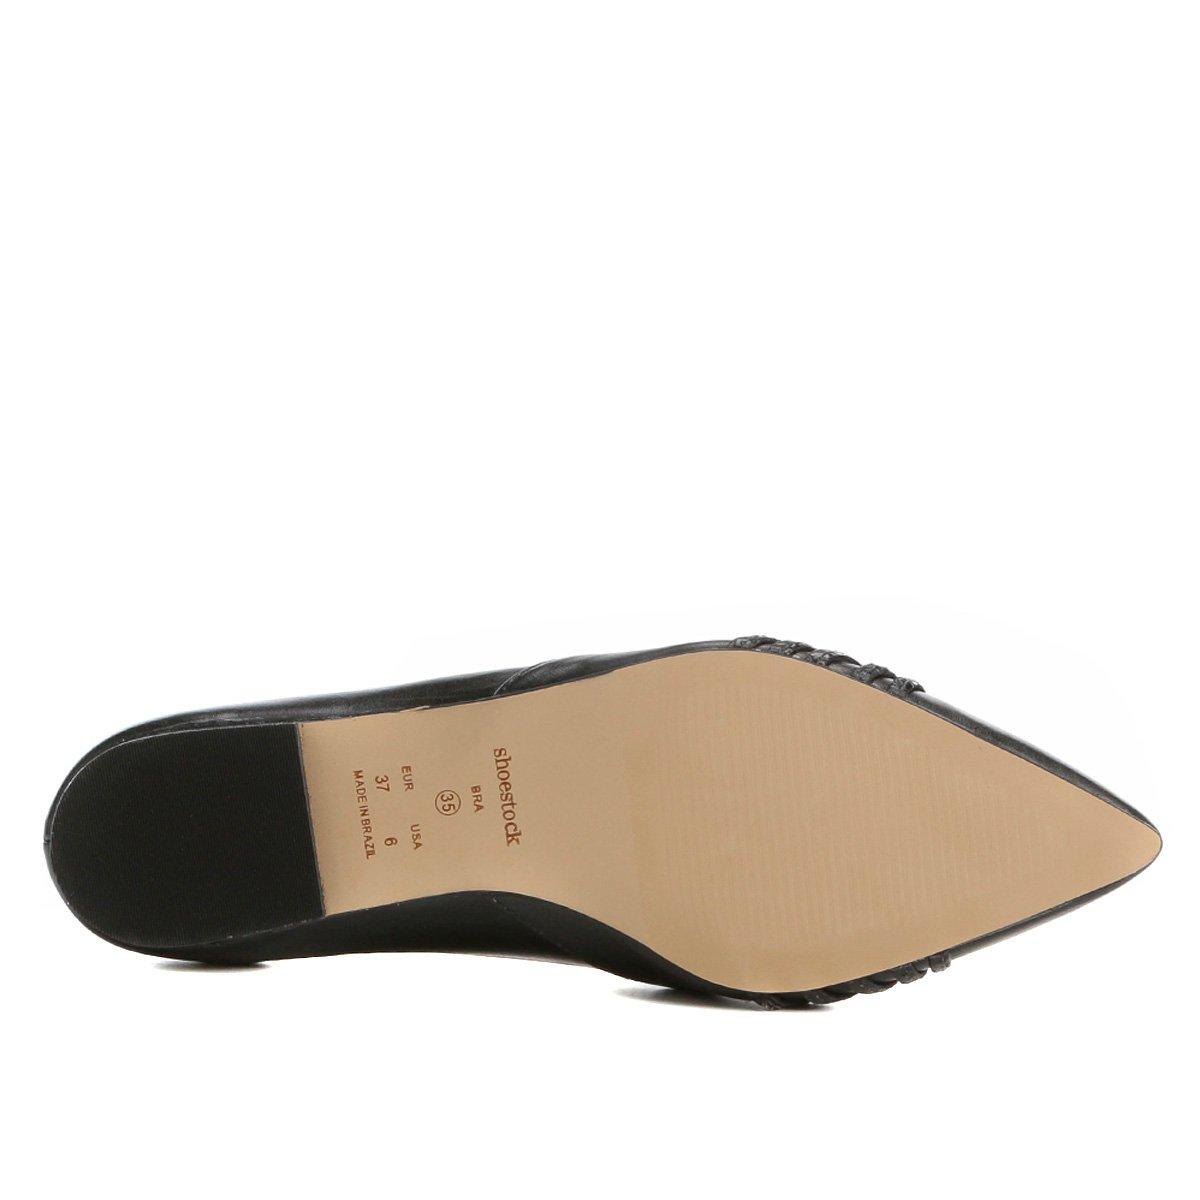 Bico Bico Nó Feminina Fino Sapatilha Shoestock Sapatilha Preto Couro Couro Shoestock FwBqdF